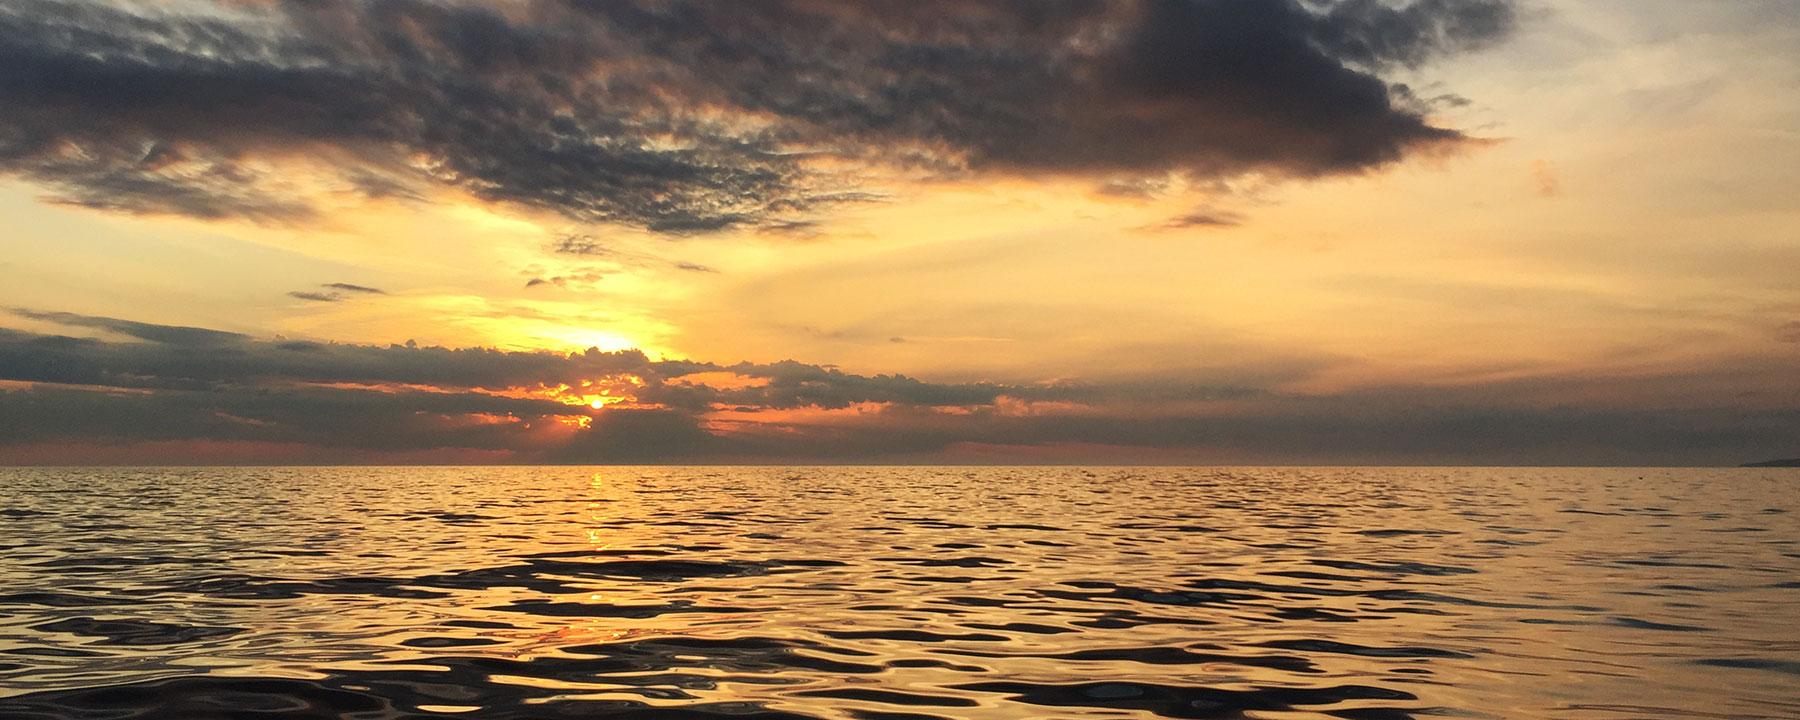 Little Traverse Bay Sunset